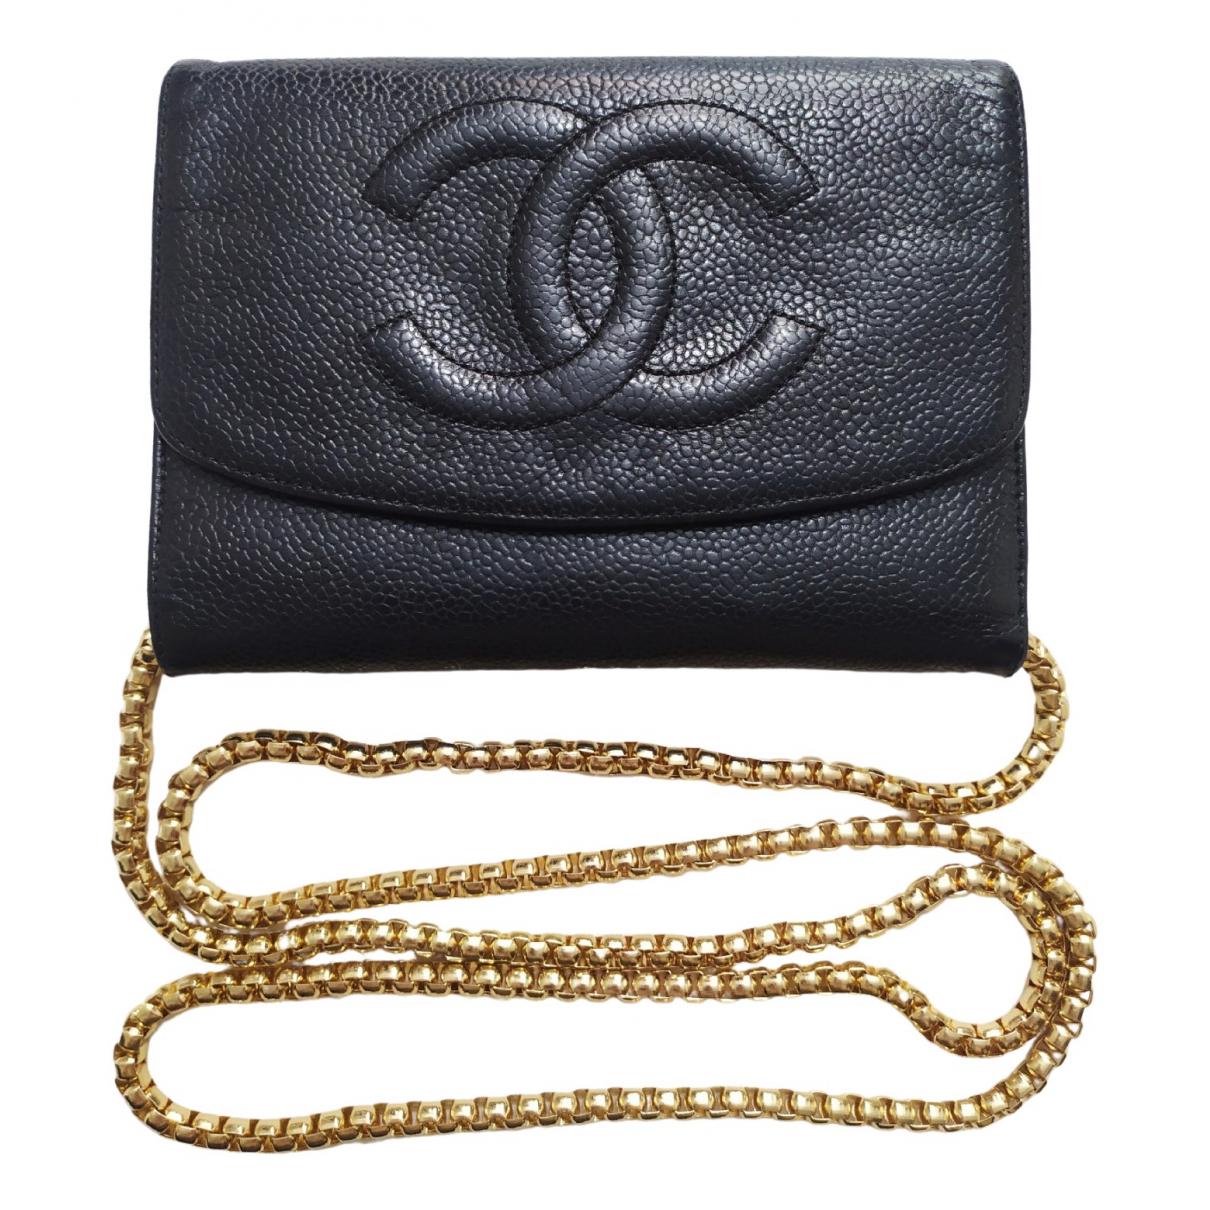 Chanel \N Black Leather wallet for Women \N